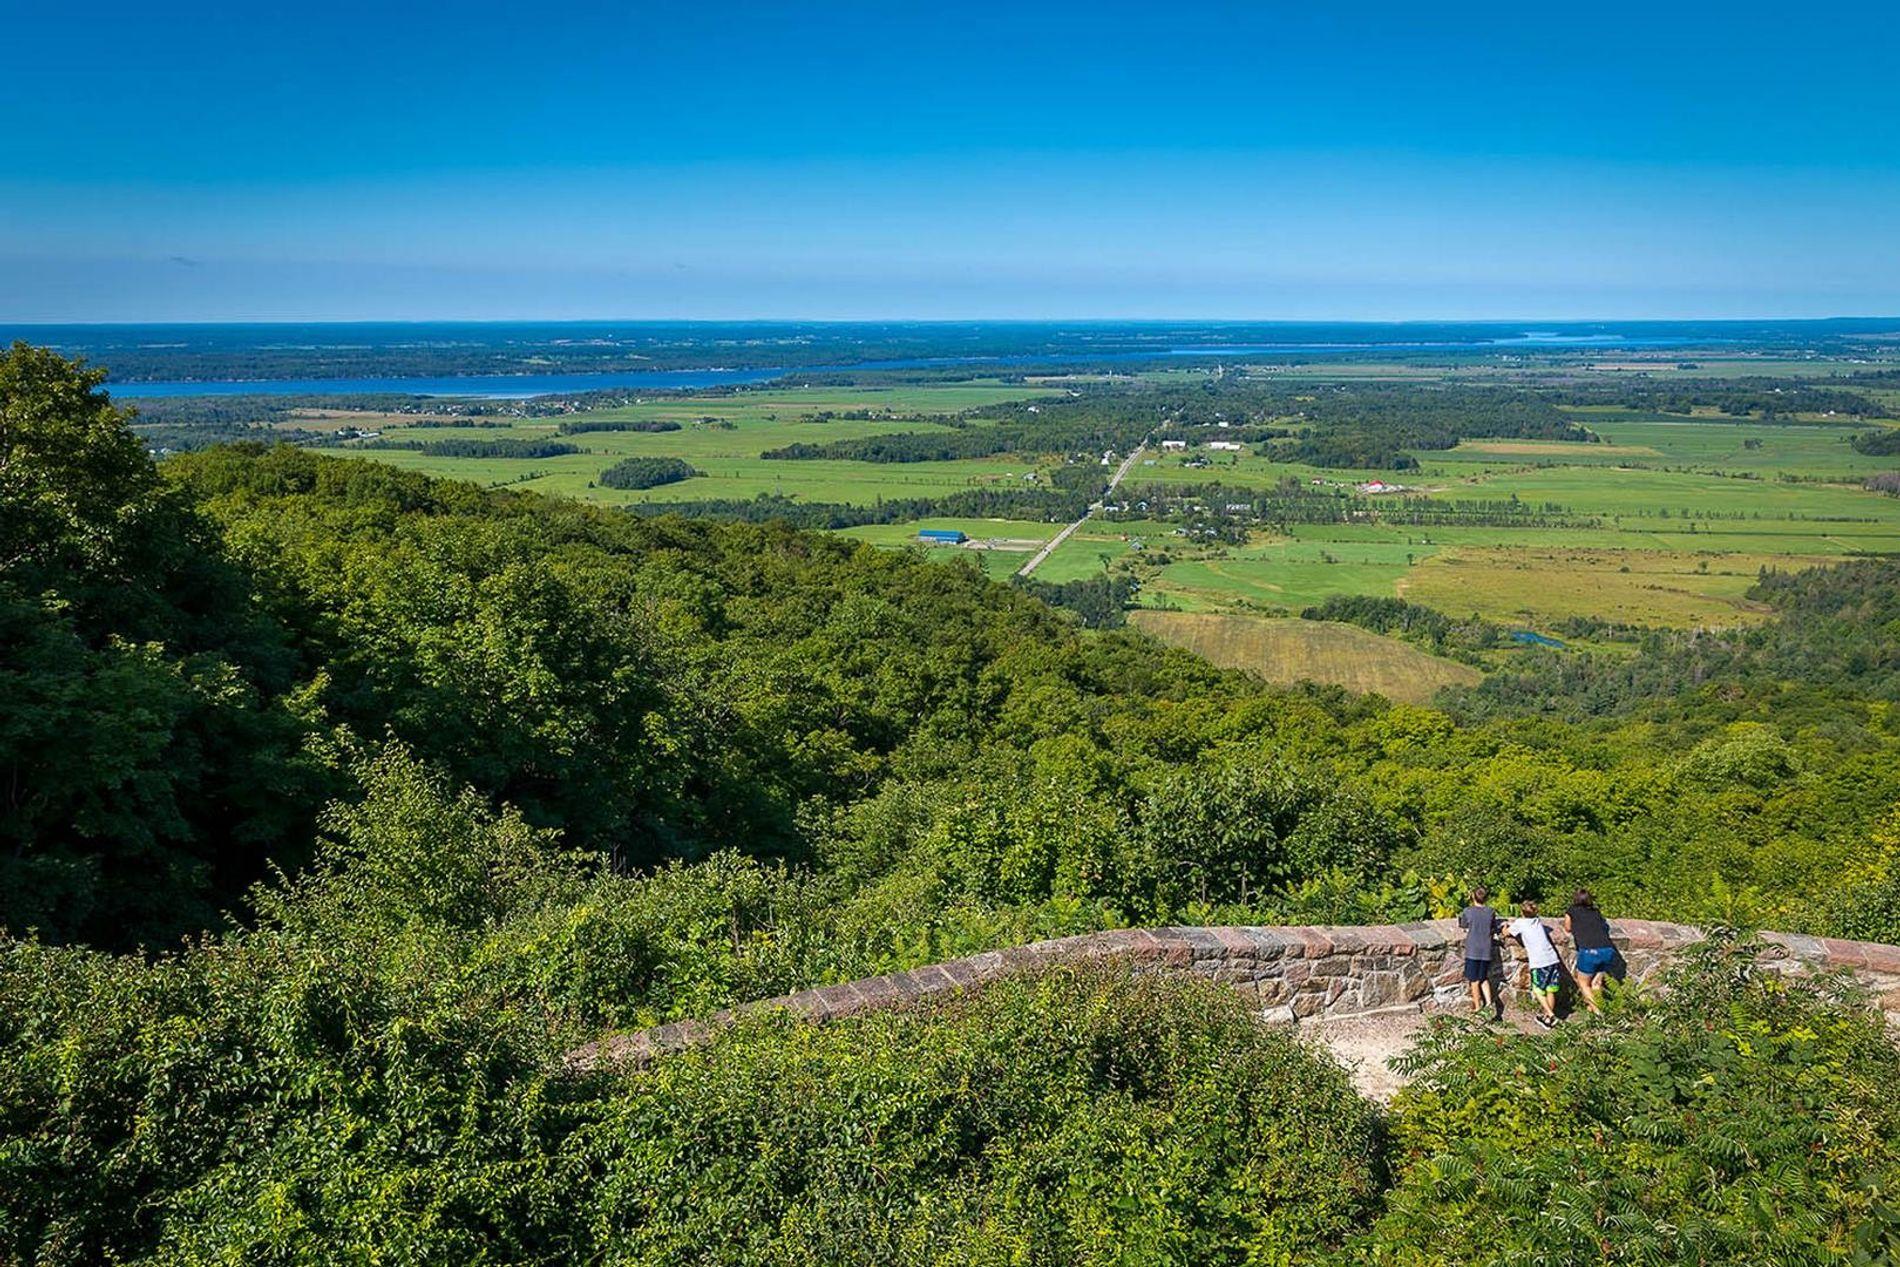 Der beliebteste Aussichtspunkt im Gatineau Park ist der Champlain Lookout auf dem Eardley Escarpment direkt am ...